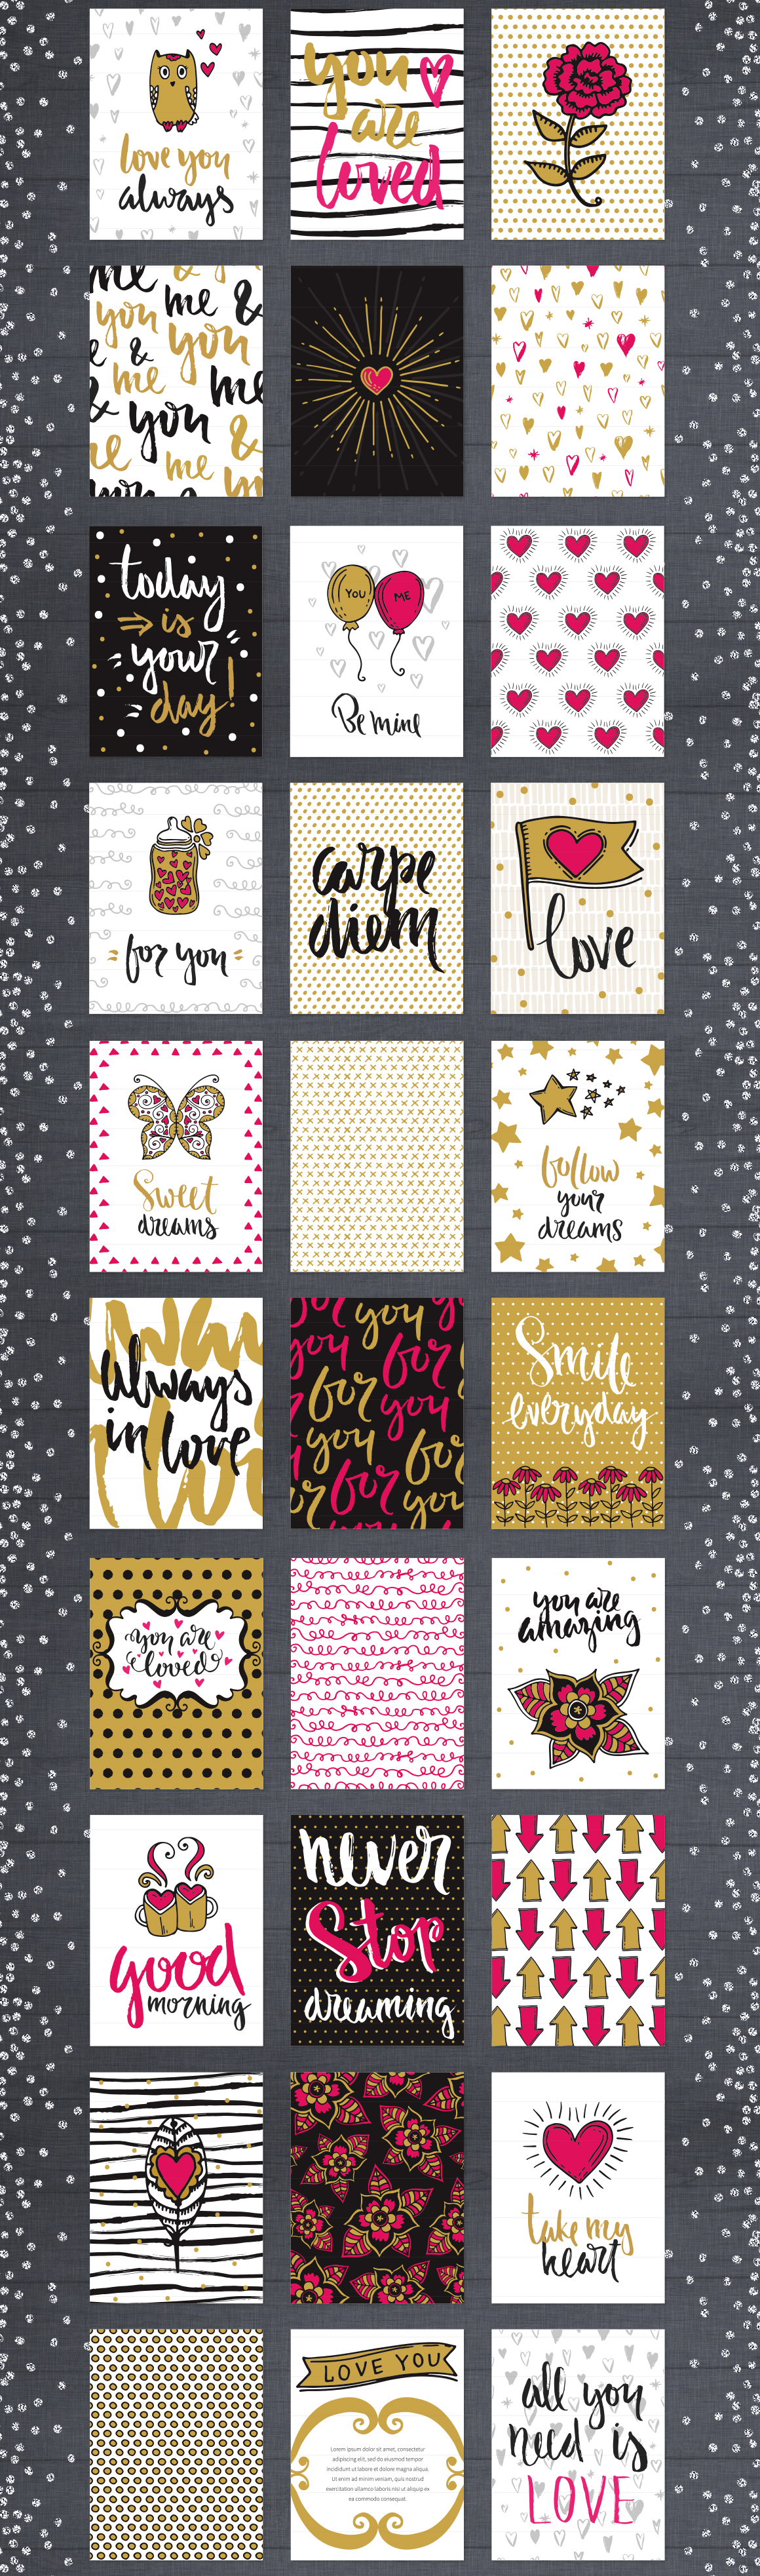 60 Valentine's Day Romantic Cards #4 example image 2